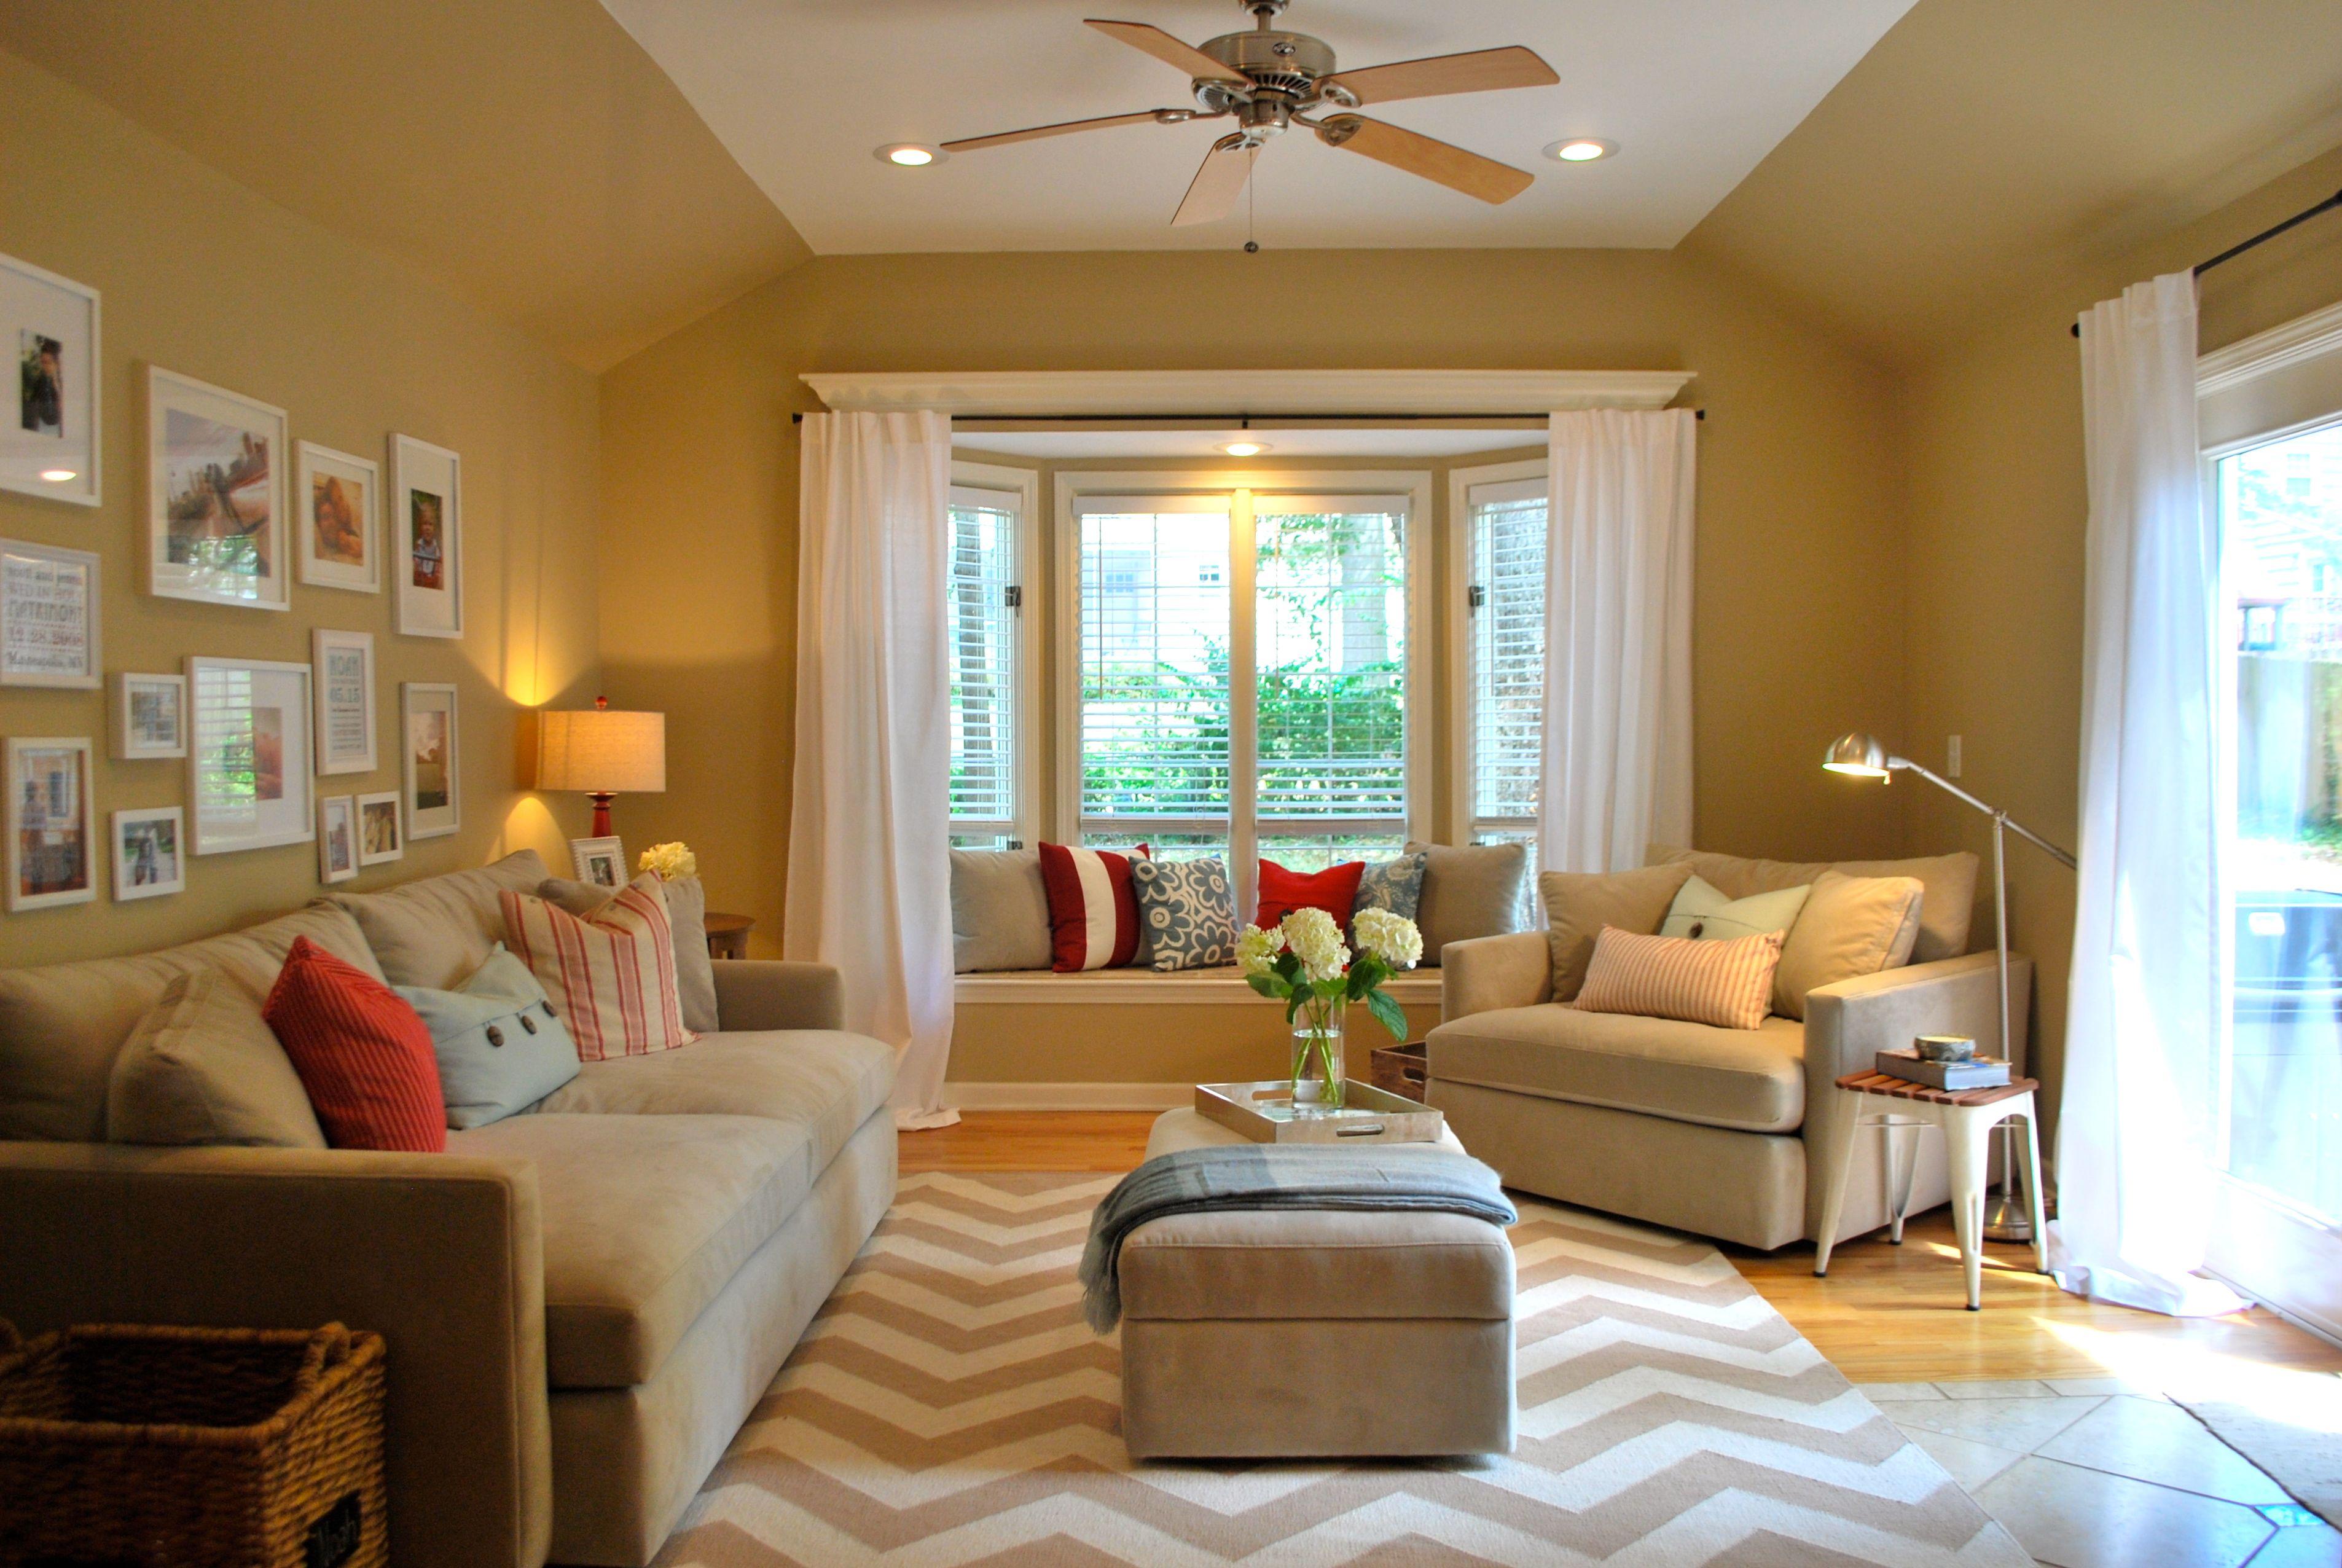 crate and barrel living room ideas. Final Living Room Design, The Suburban Urbanist Midwestern Coastal Retreat Crate And Barrel Ideas O